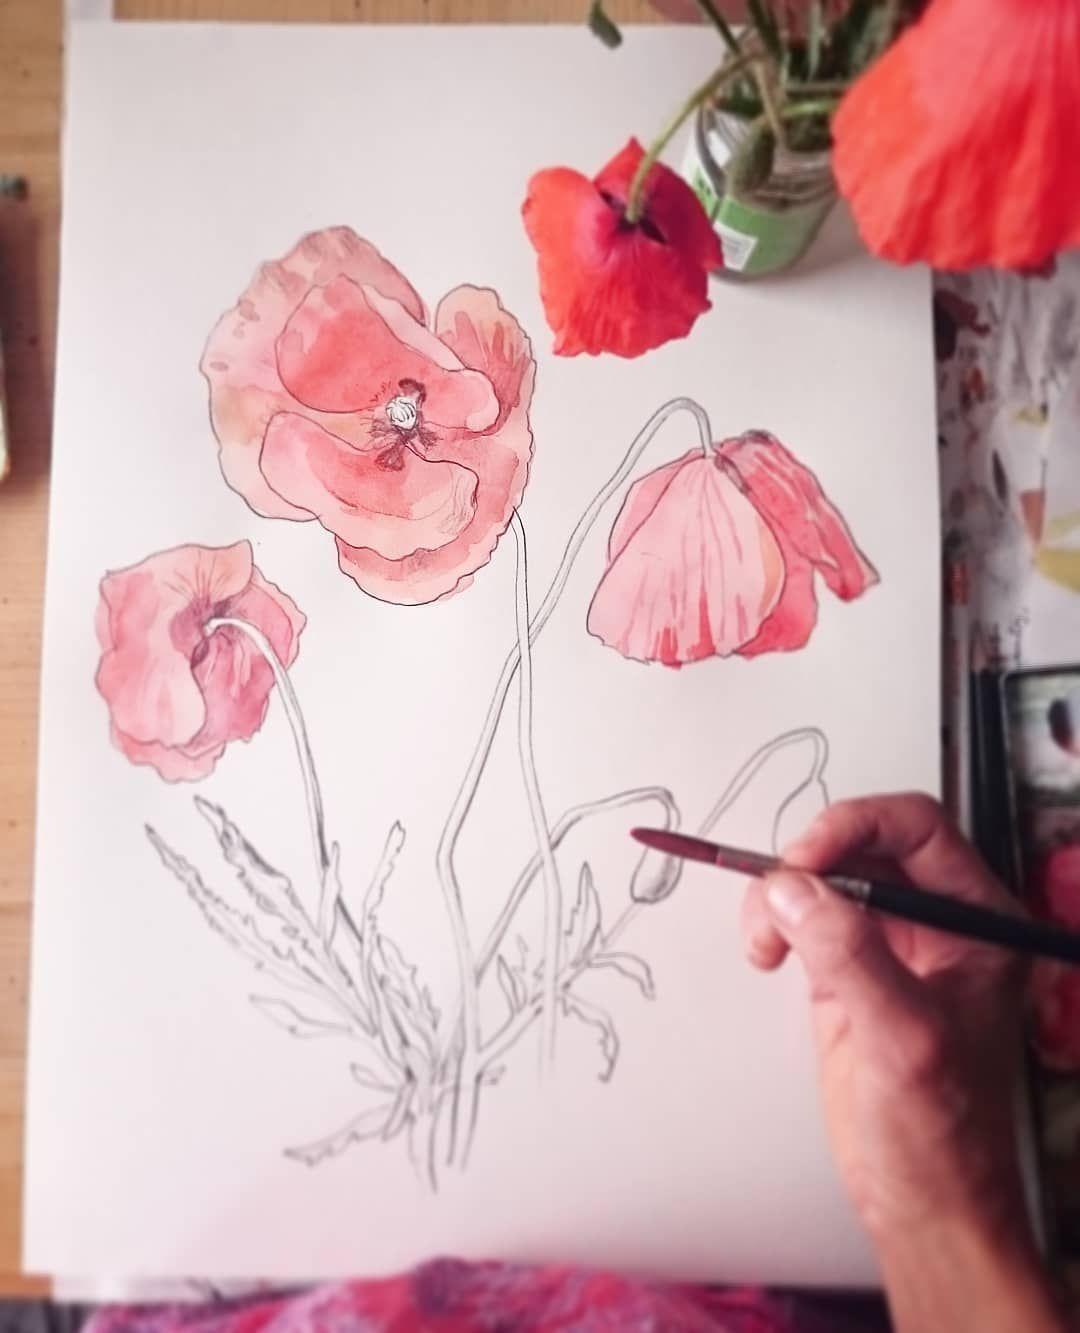 P O P P Y Blumen Malen Aquarellmalerei Mohnblume